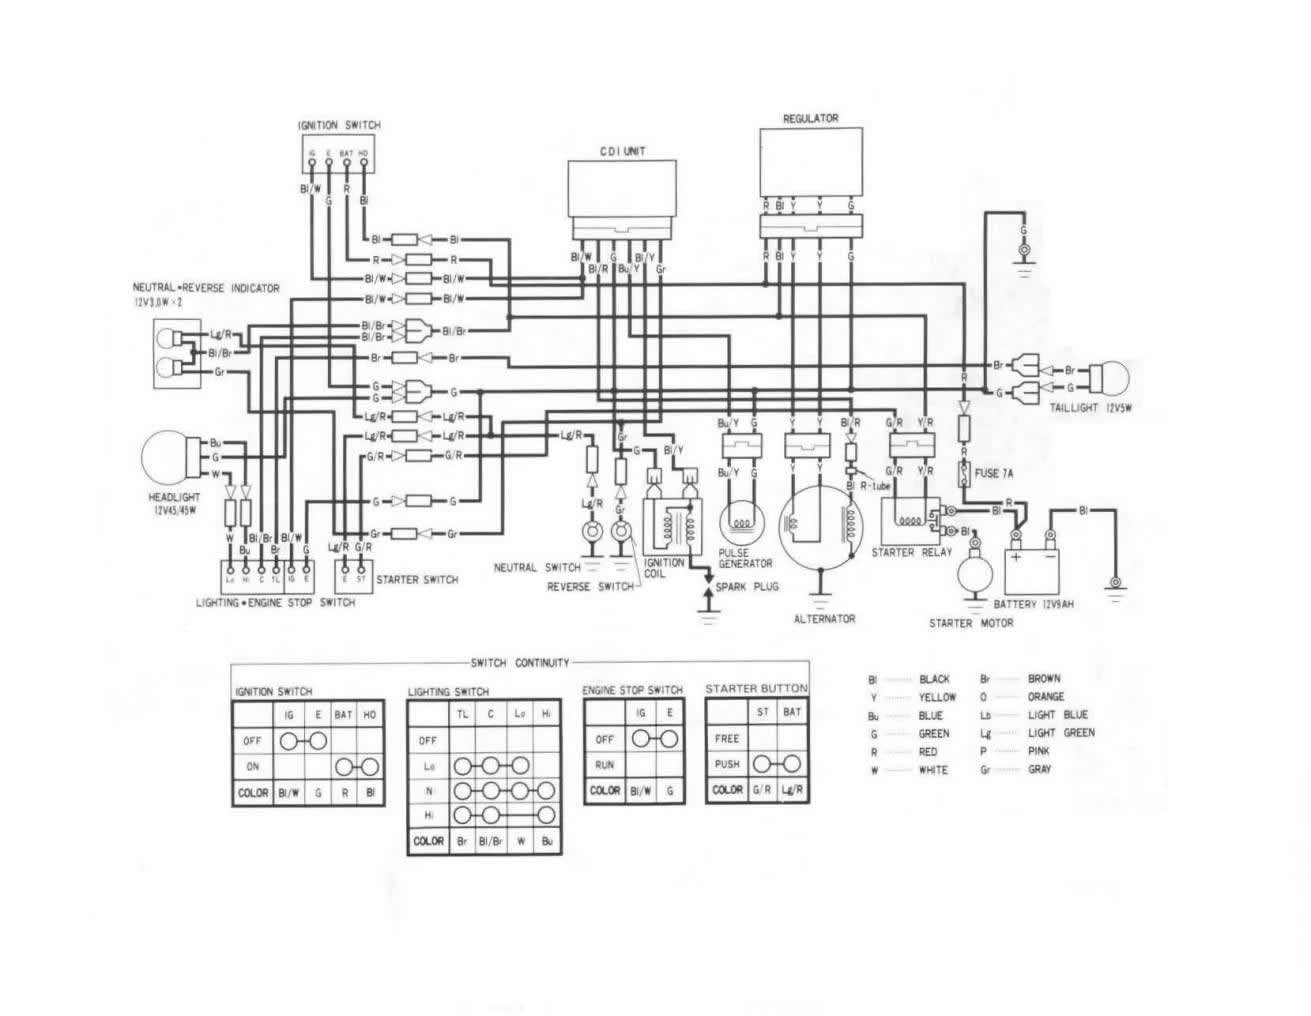 1985 honda trx 125 rewiring help honda atv forum